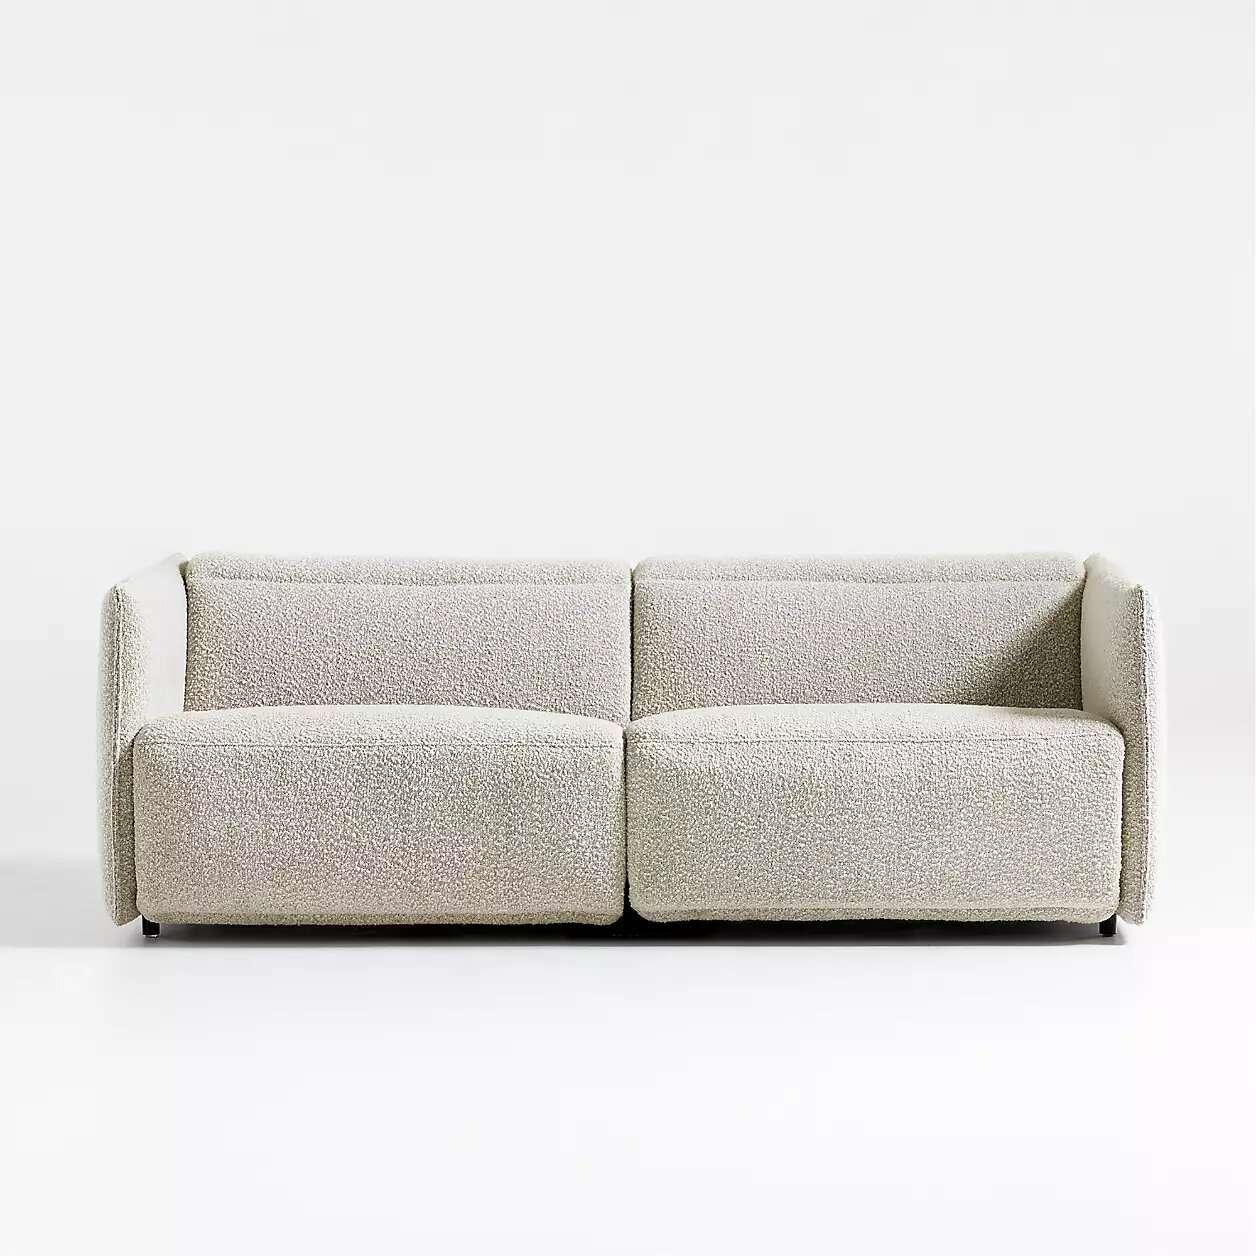 Crate & Barrel Leisure Power Recliner Sofa